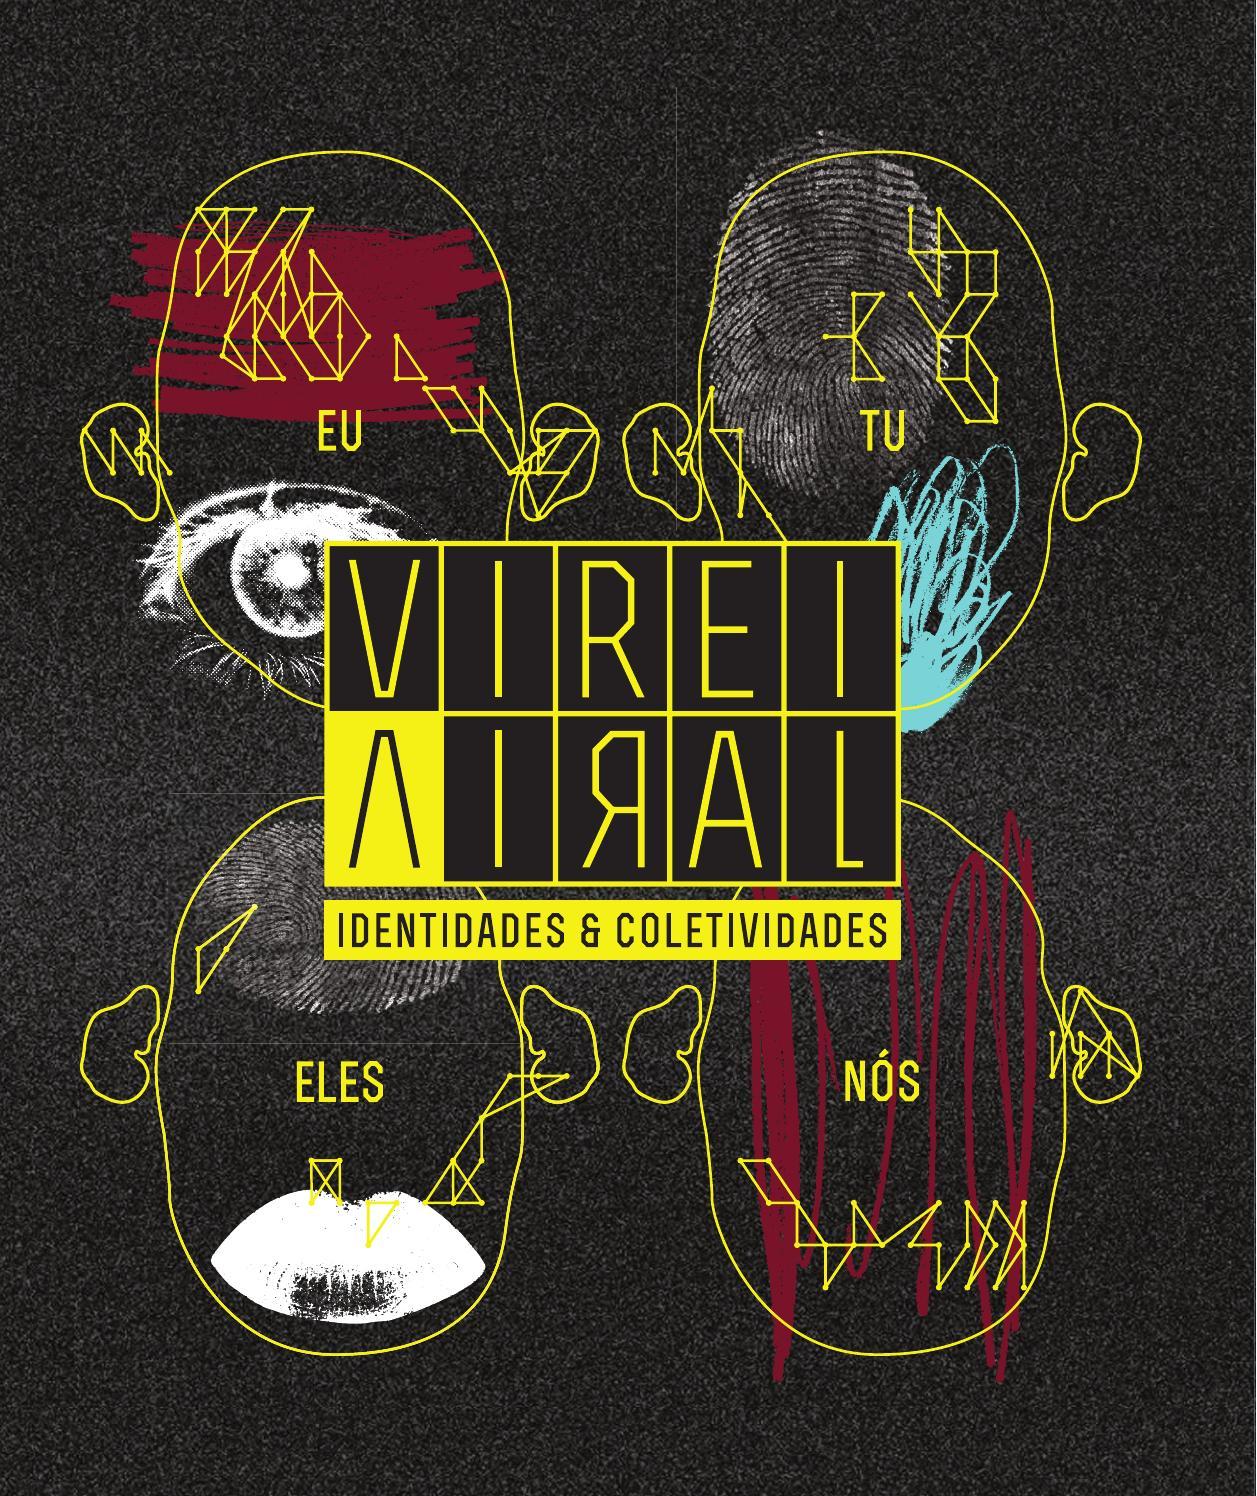 Catálogo Virei Viral 2014 by estúdio M Baraká - issuu a69b4e1b95